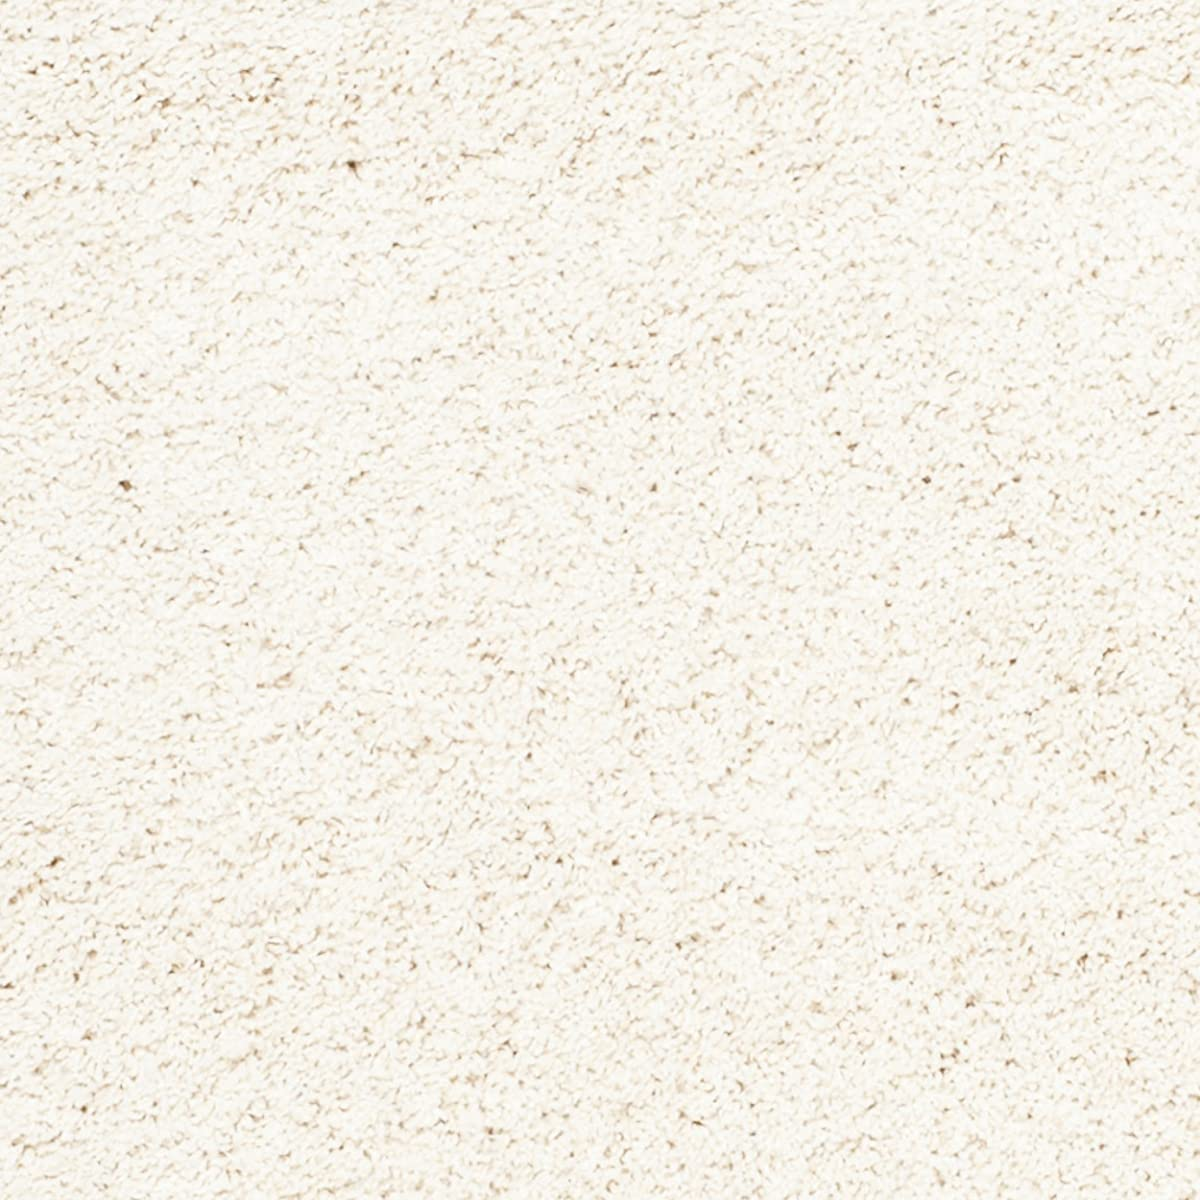 Safavieh Milan Shag Collection SG180-1212 Ivory Area Rug (6 x 9)